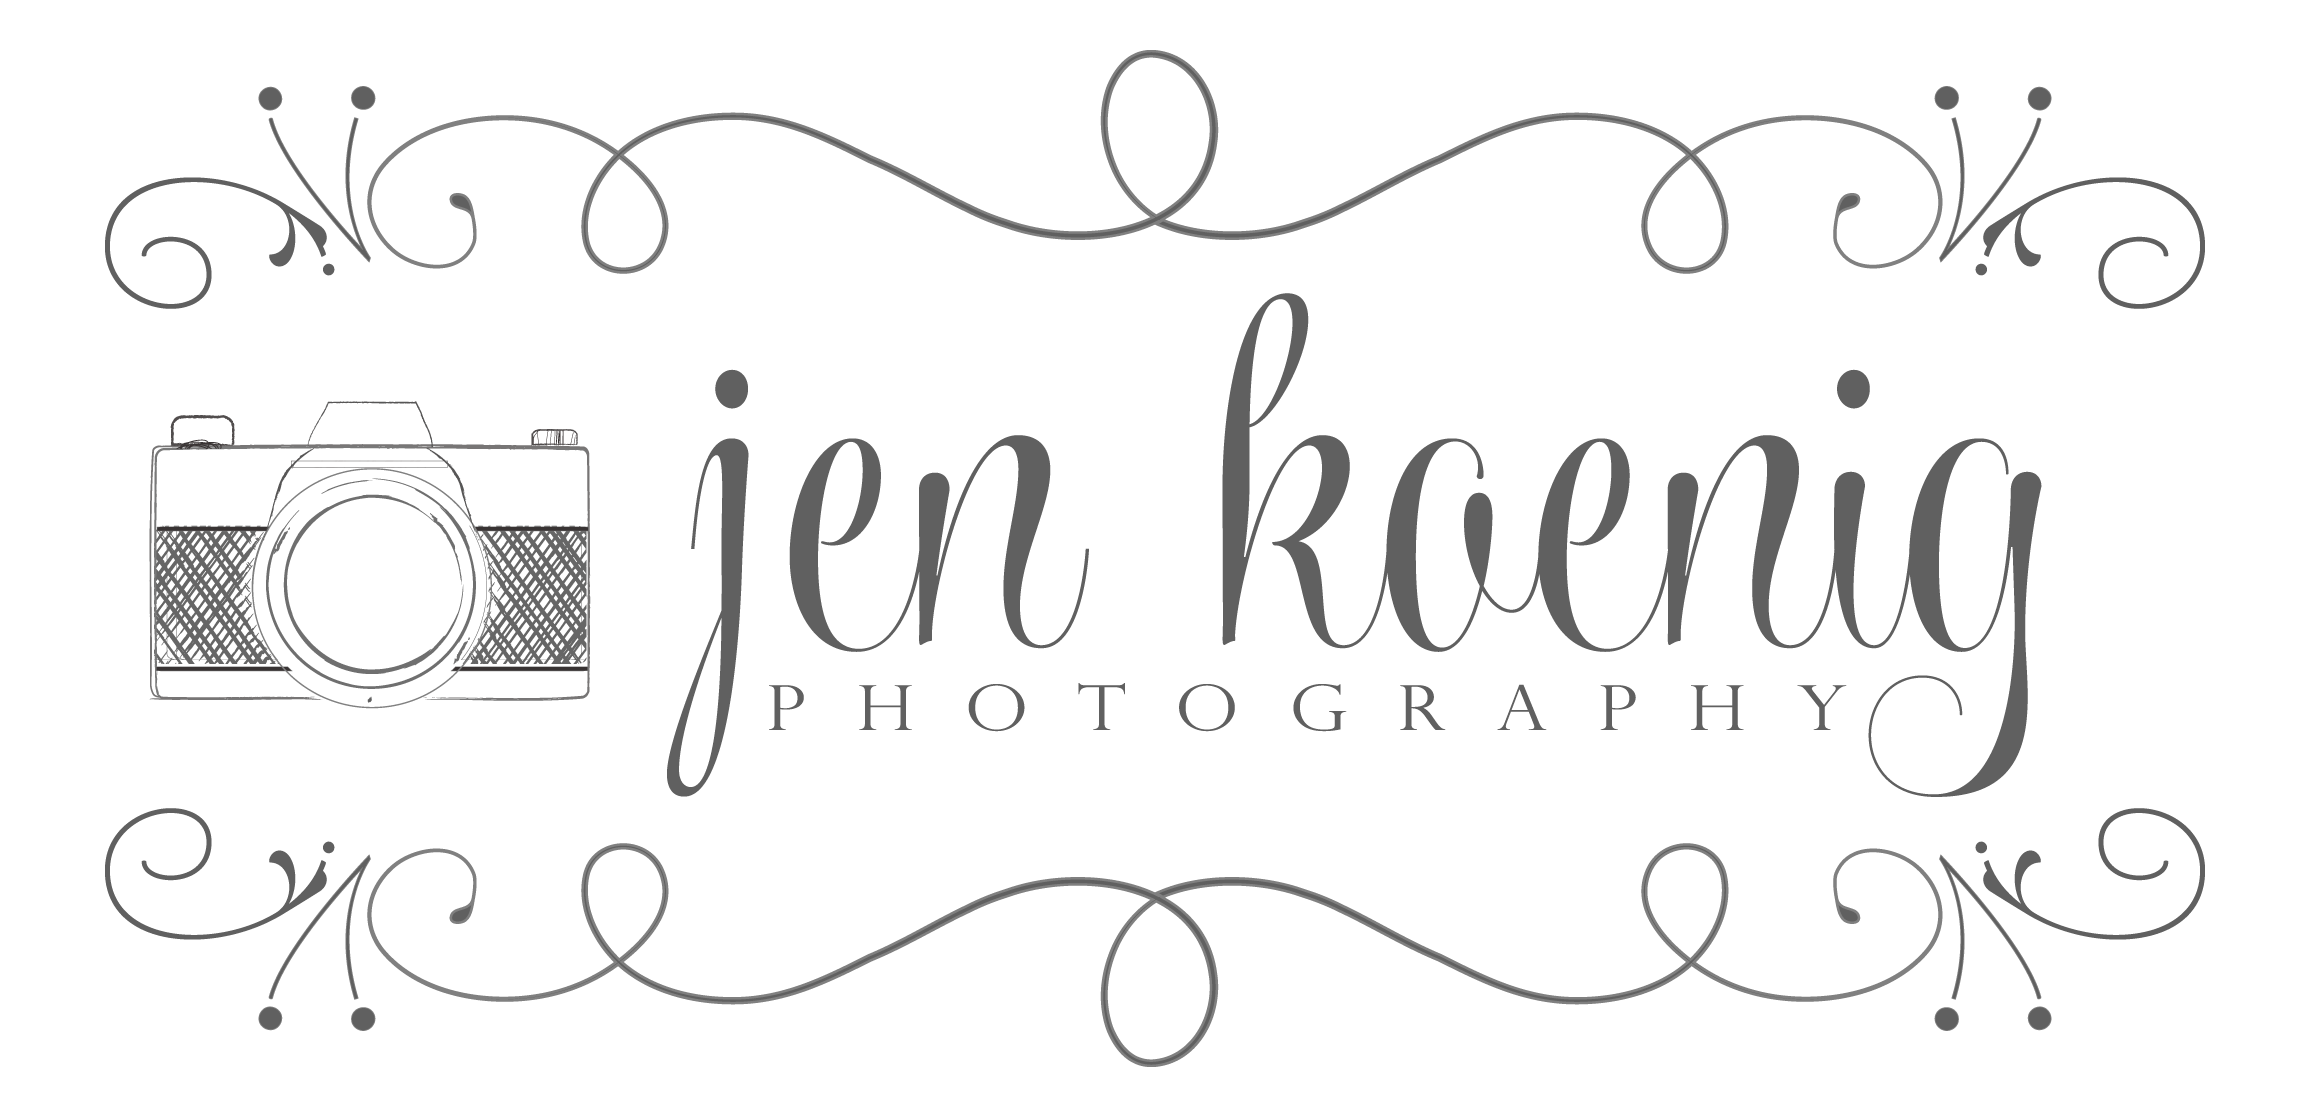 Jen Koenig Photography